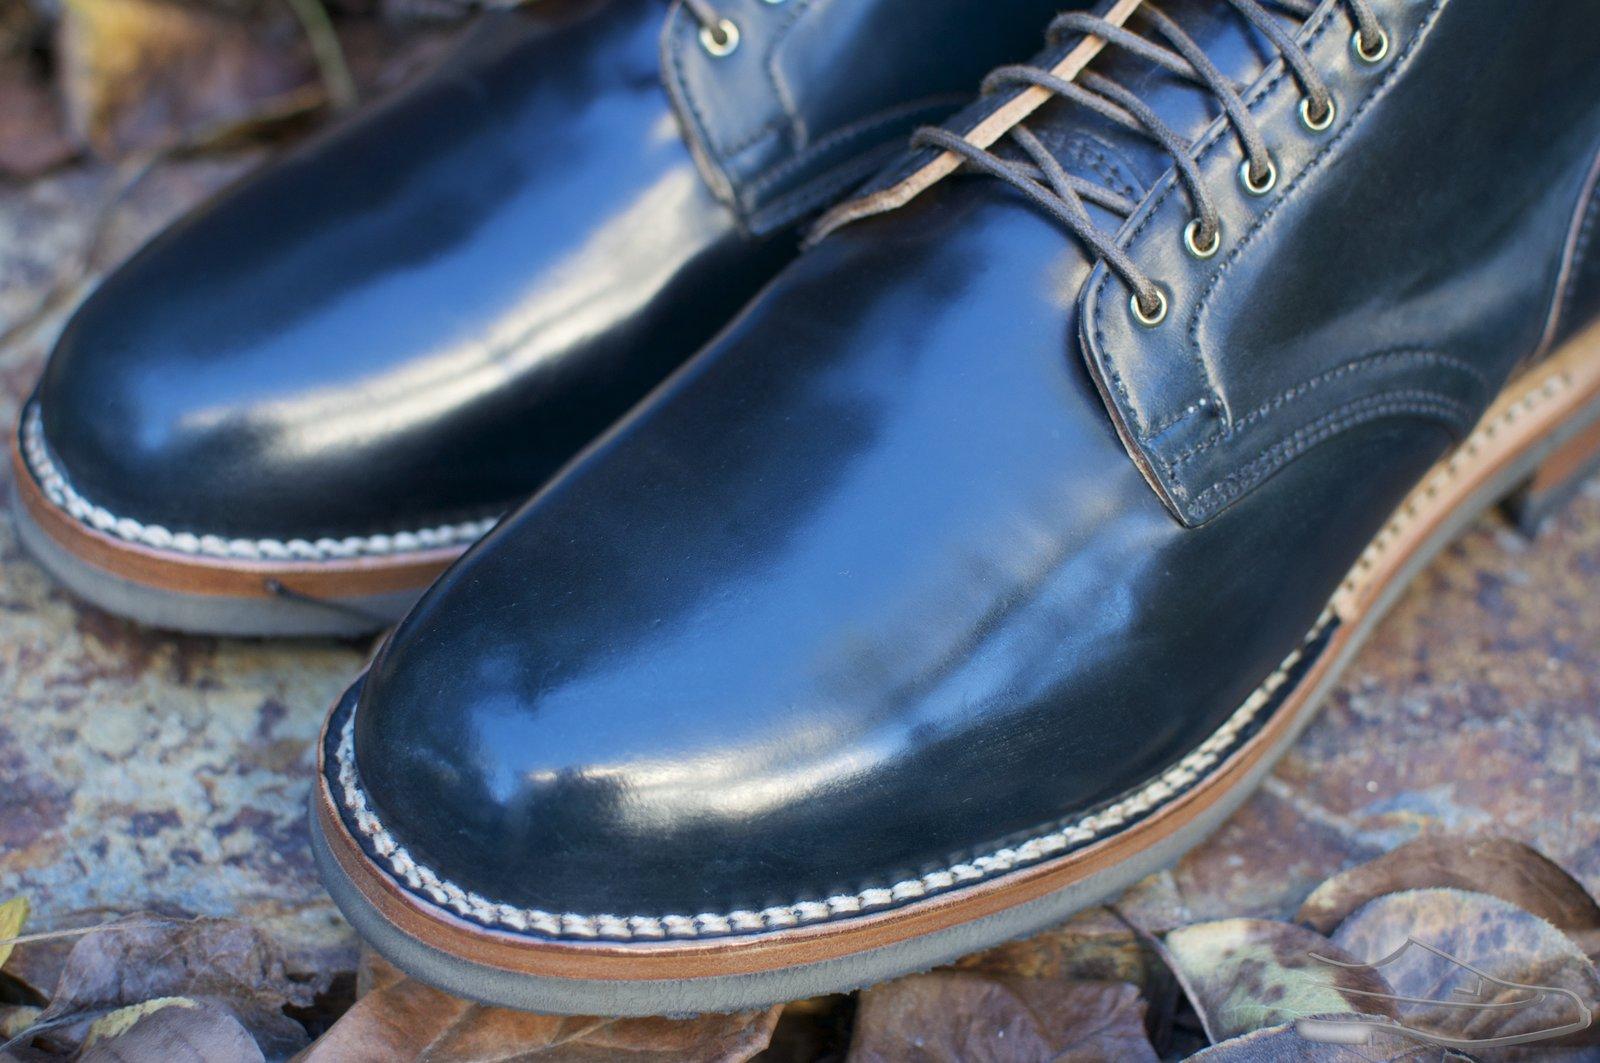 Viberg Intense Blue Shell Cordovan Service Boots - 2020-12-04 - 2.jpg